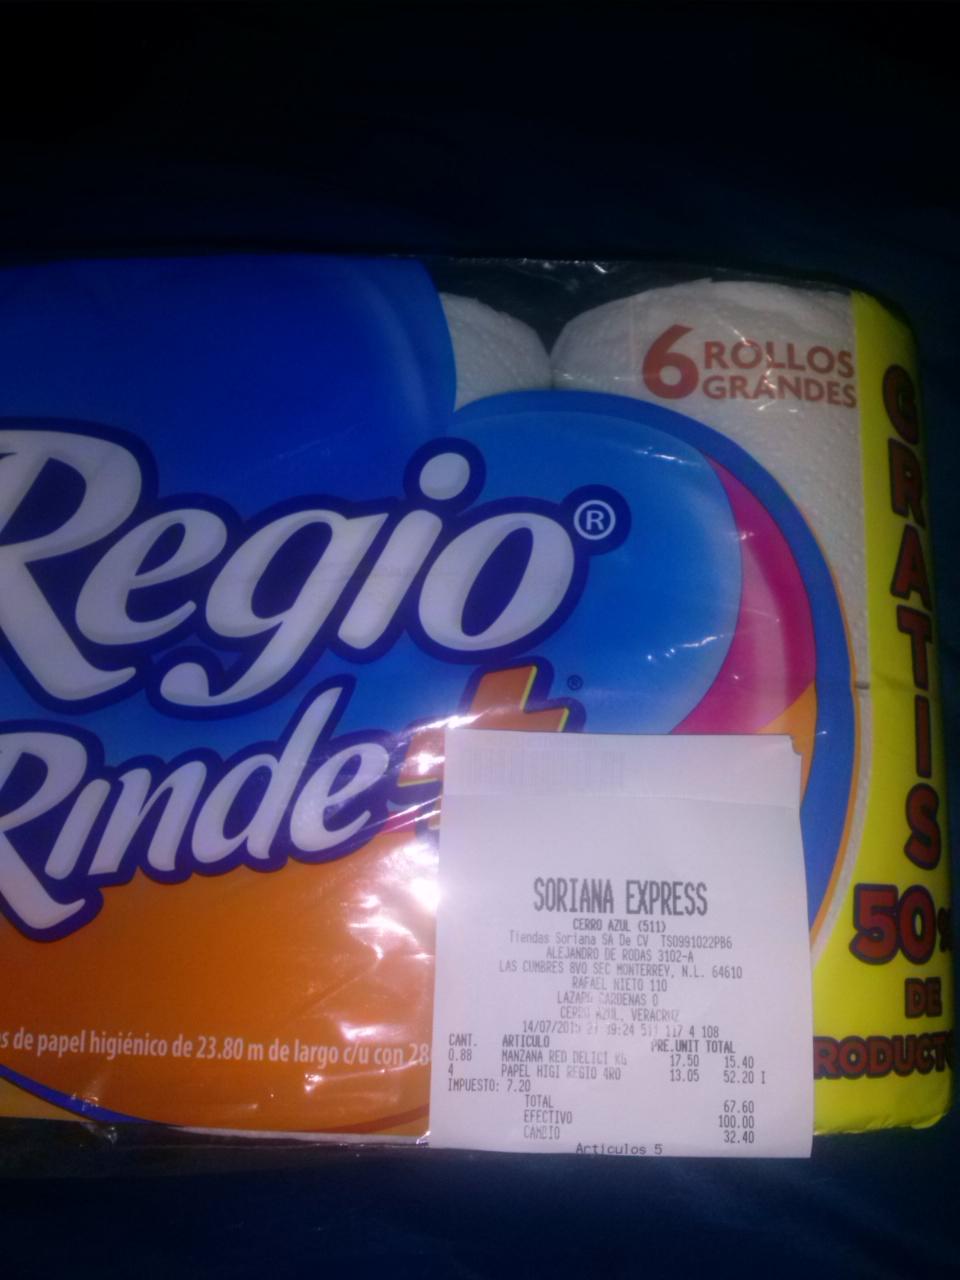 Soriana Express: papel higiénico regio rinde +